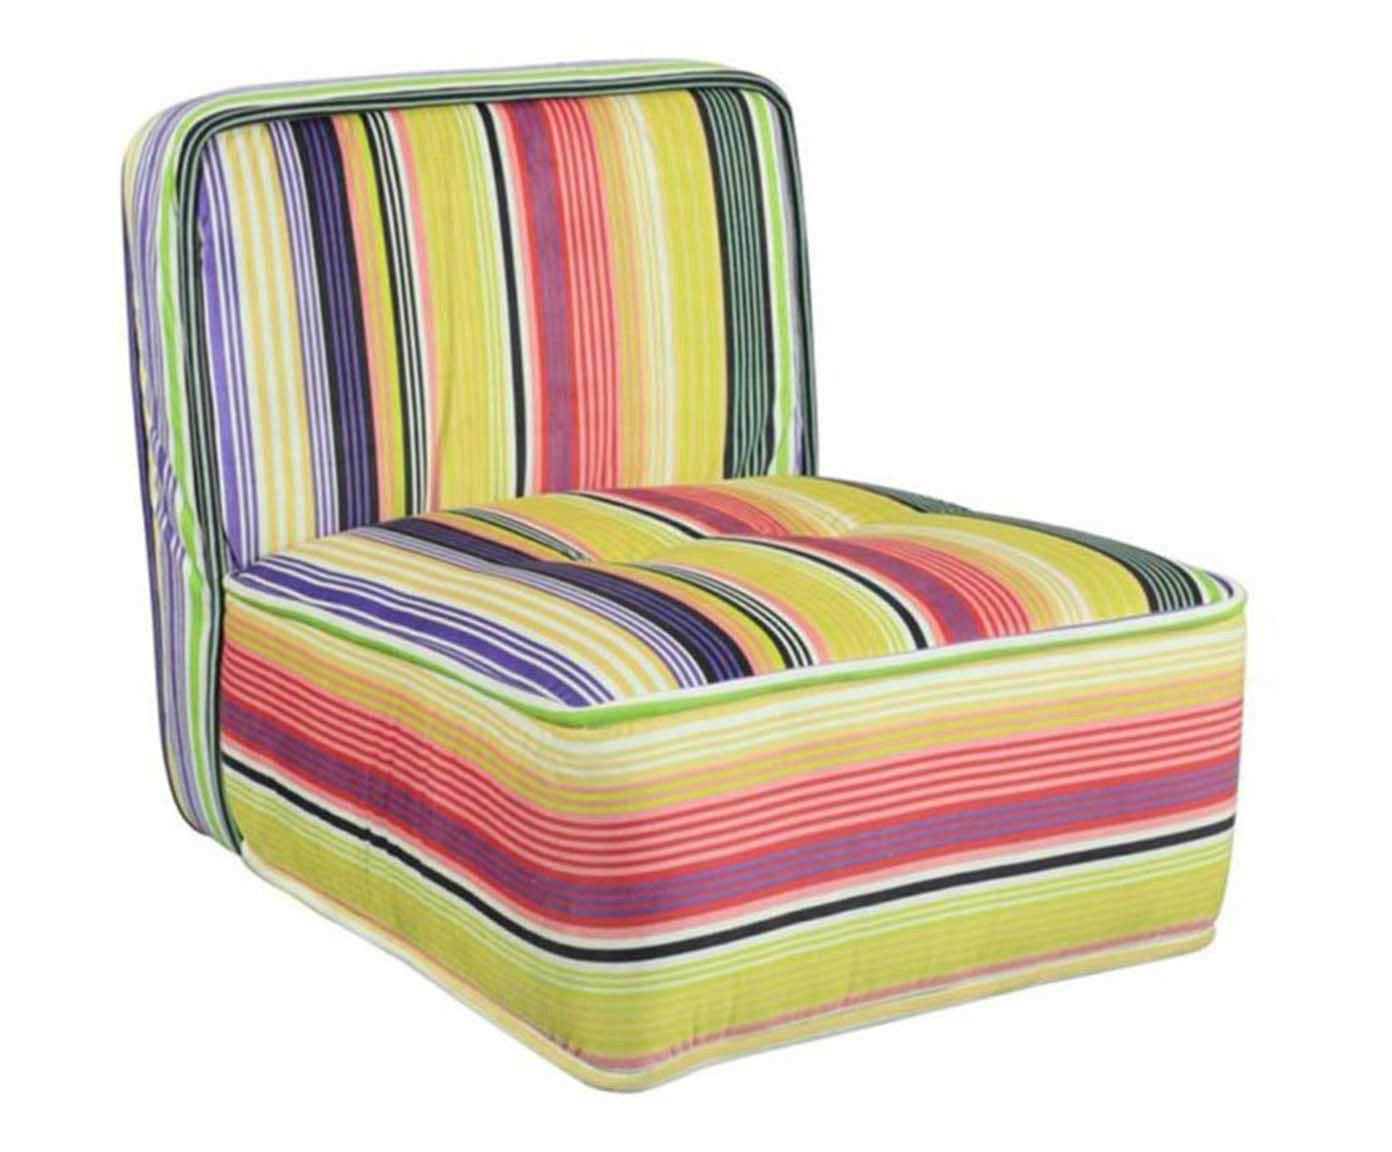 Sofá Modular Soft - Stripes | Westwing.com.br